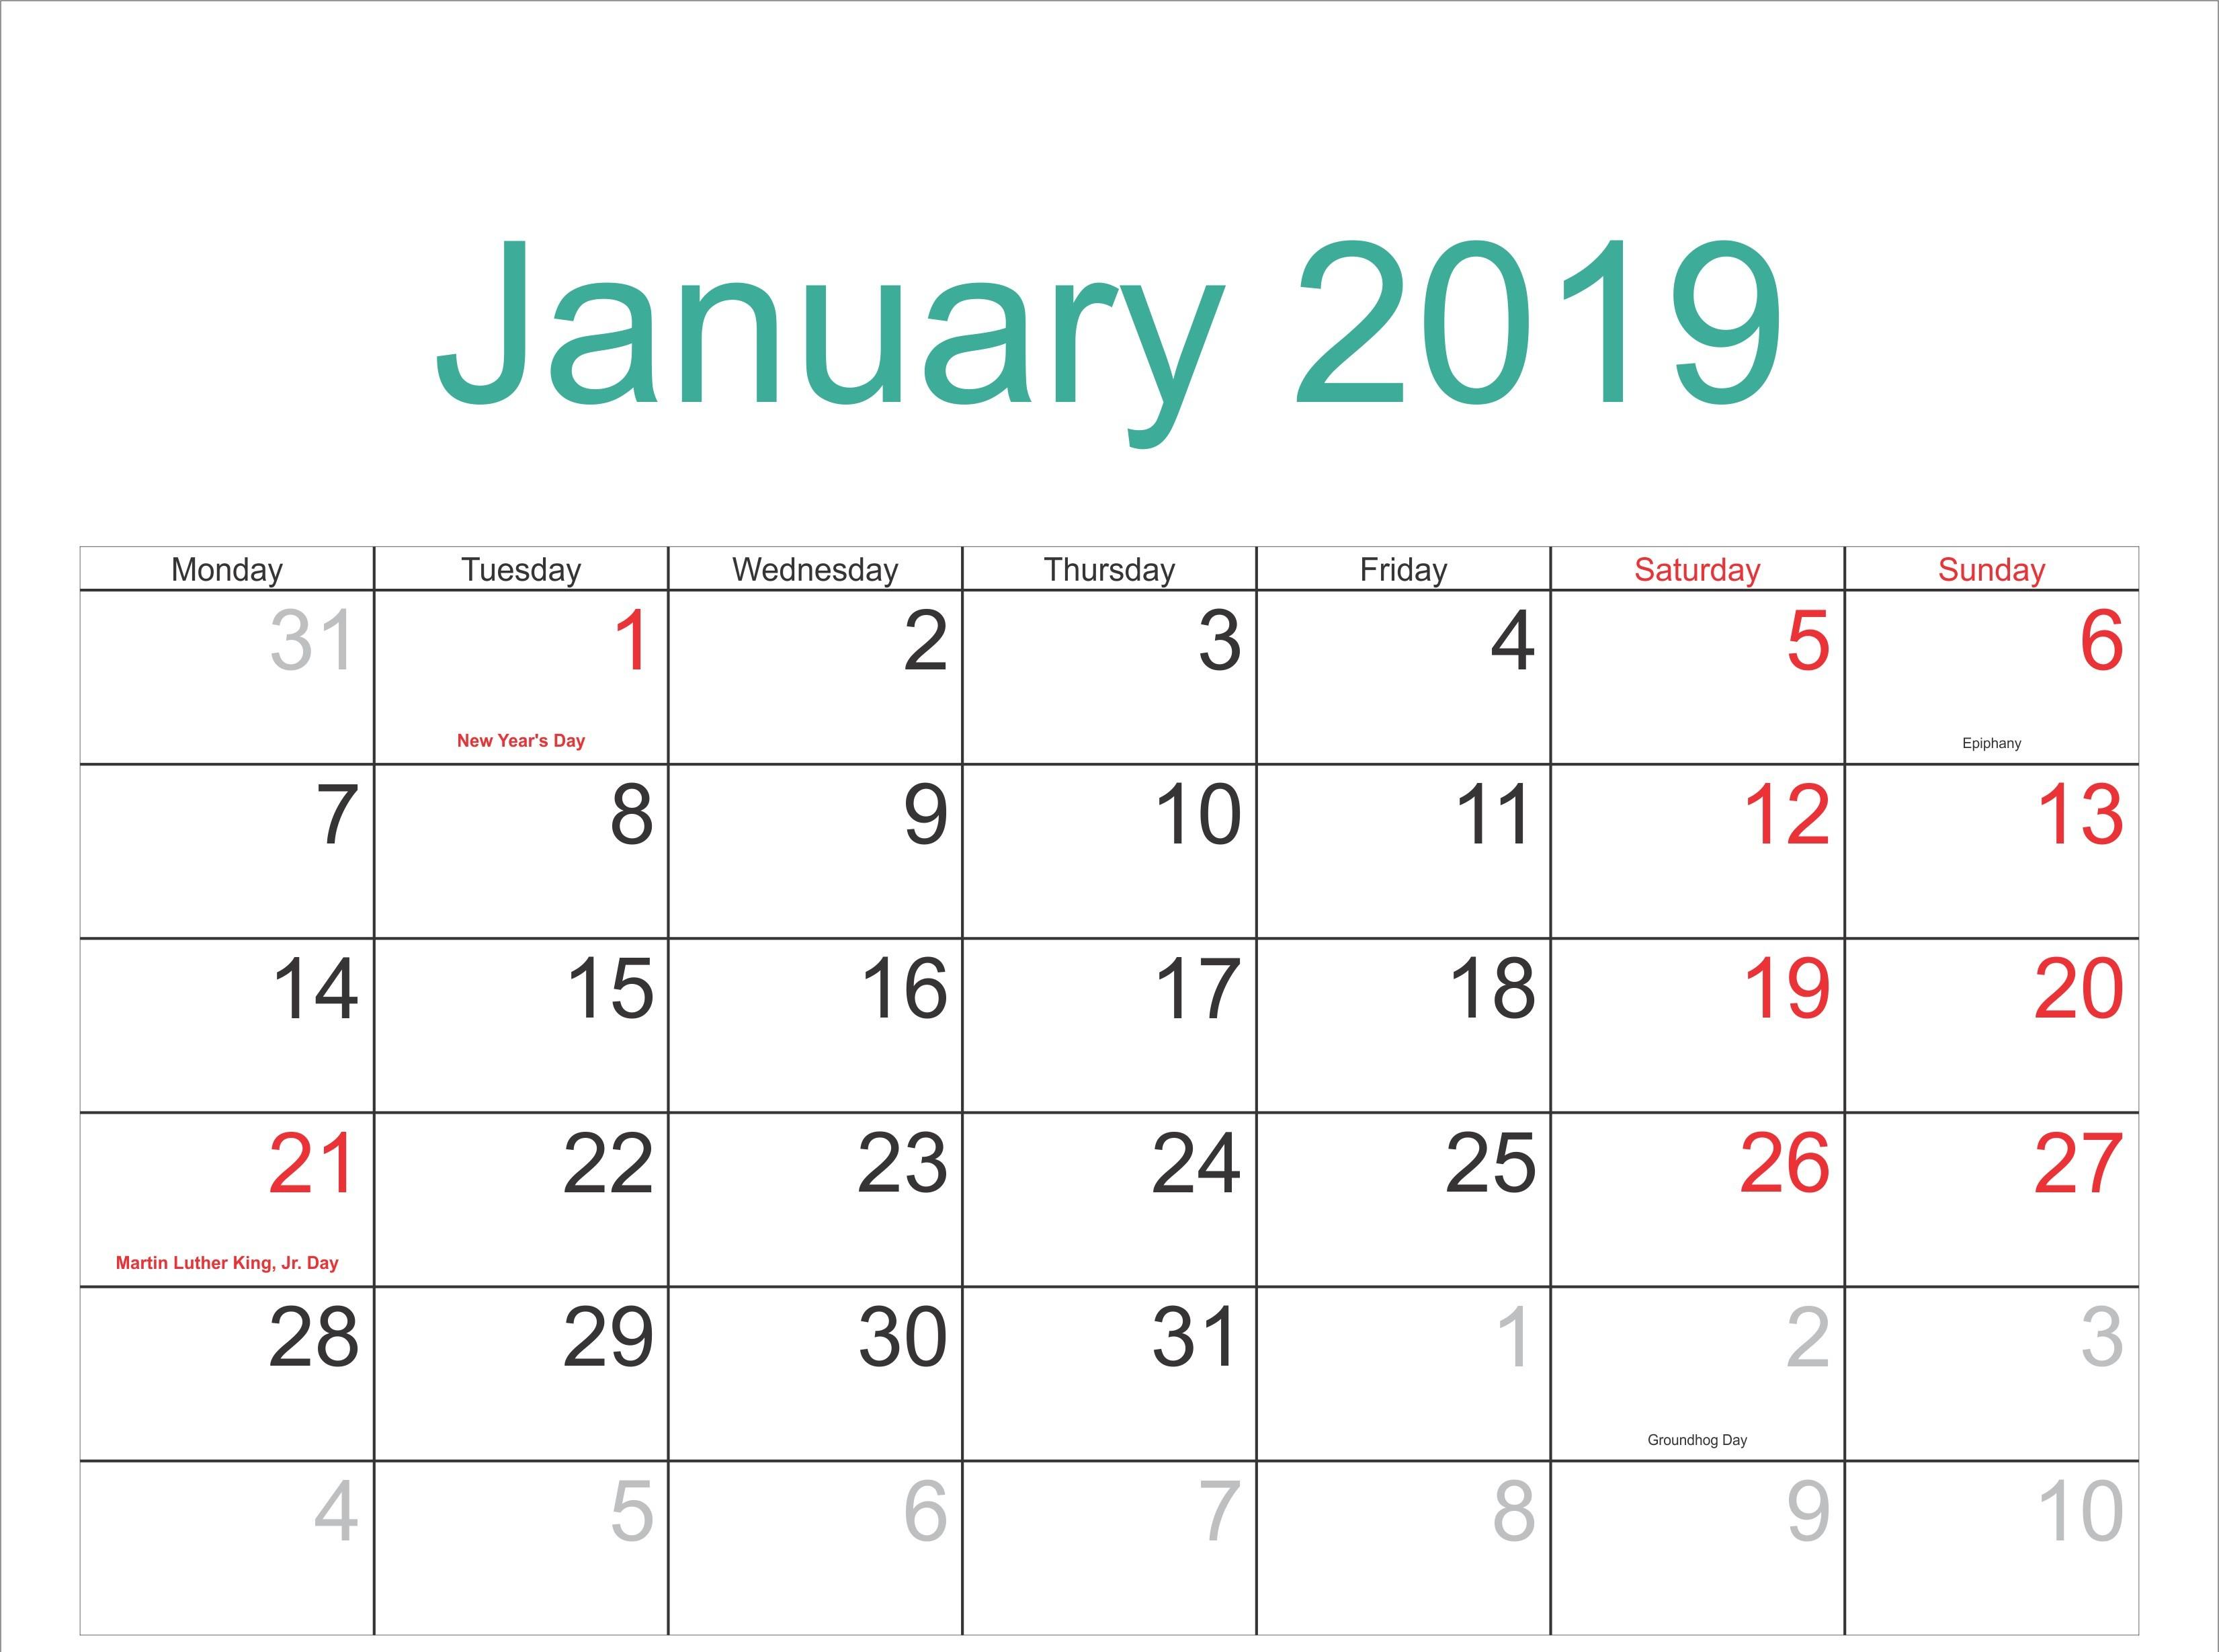 January Calendar 2019 With Holidays january2019 January